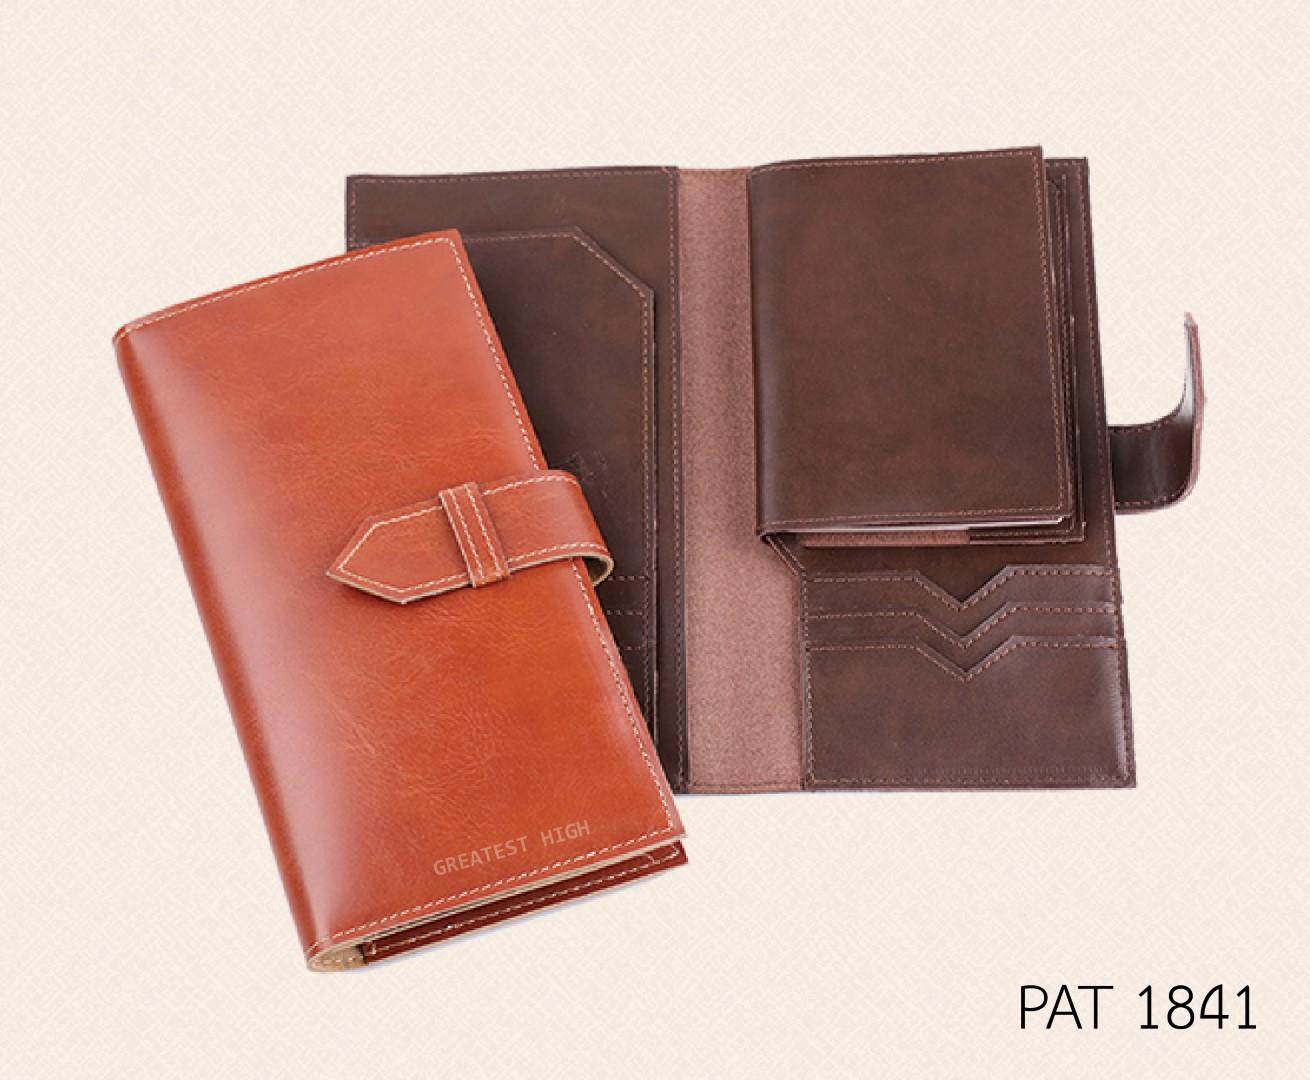 Air ticket and Passport holder : PAT 1841